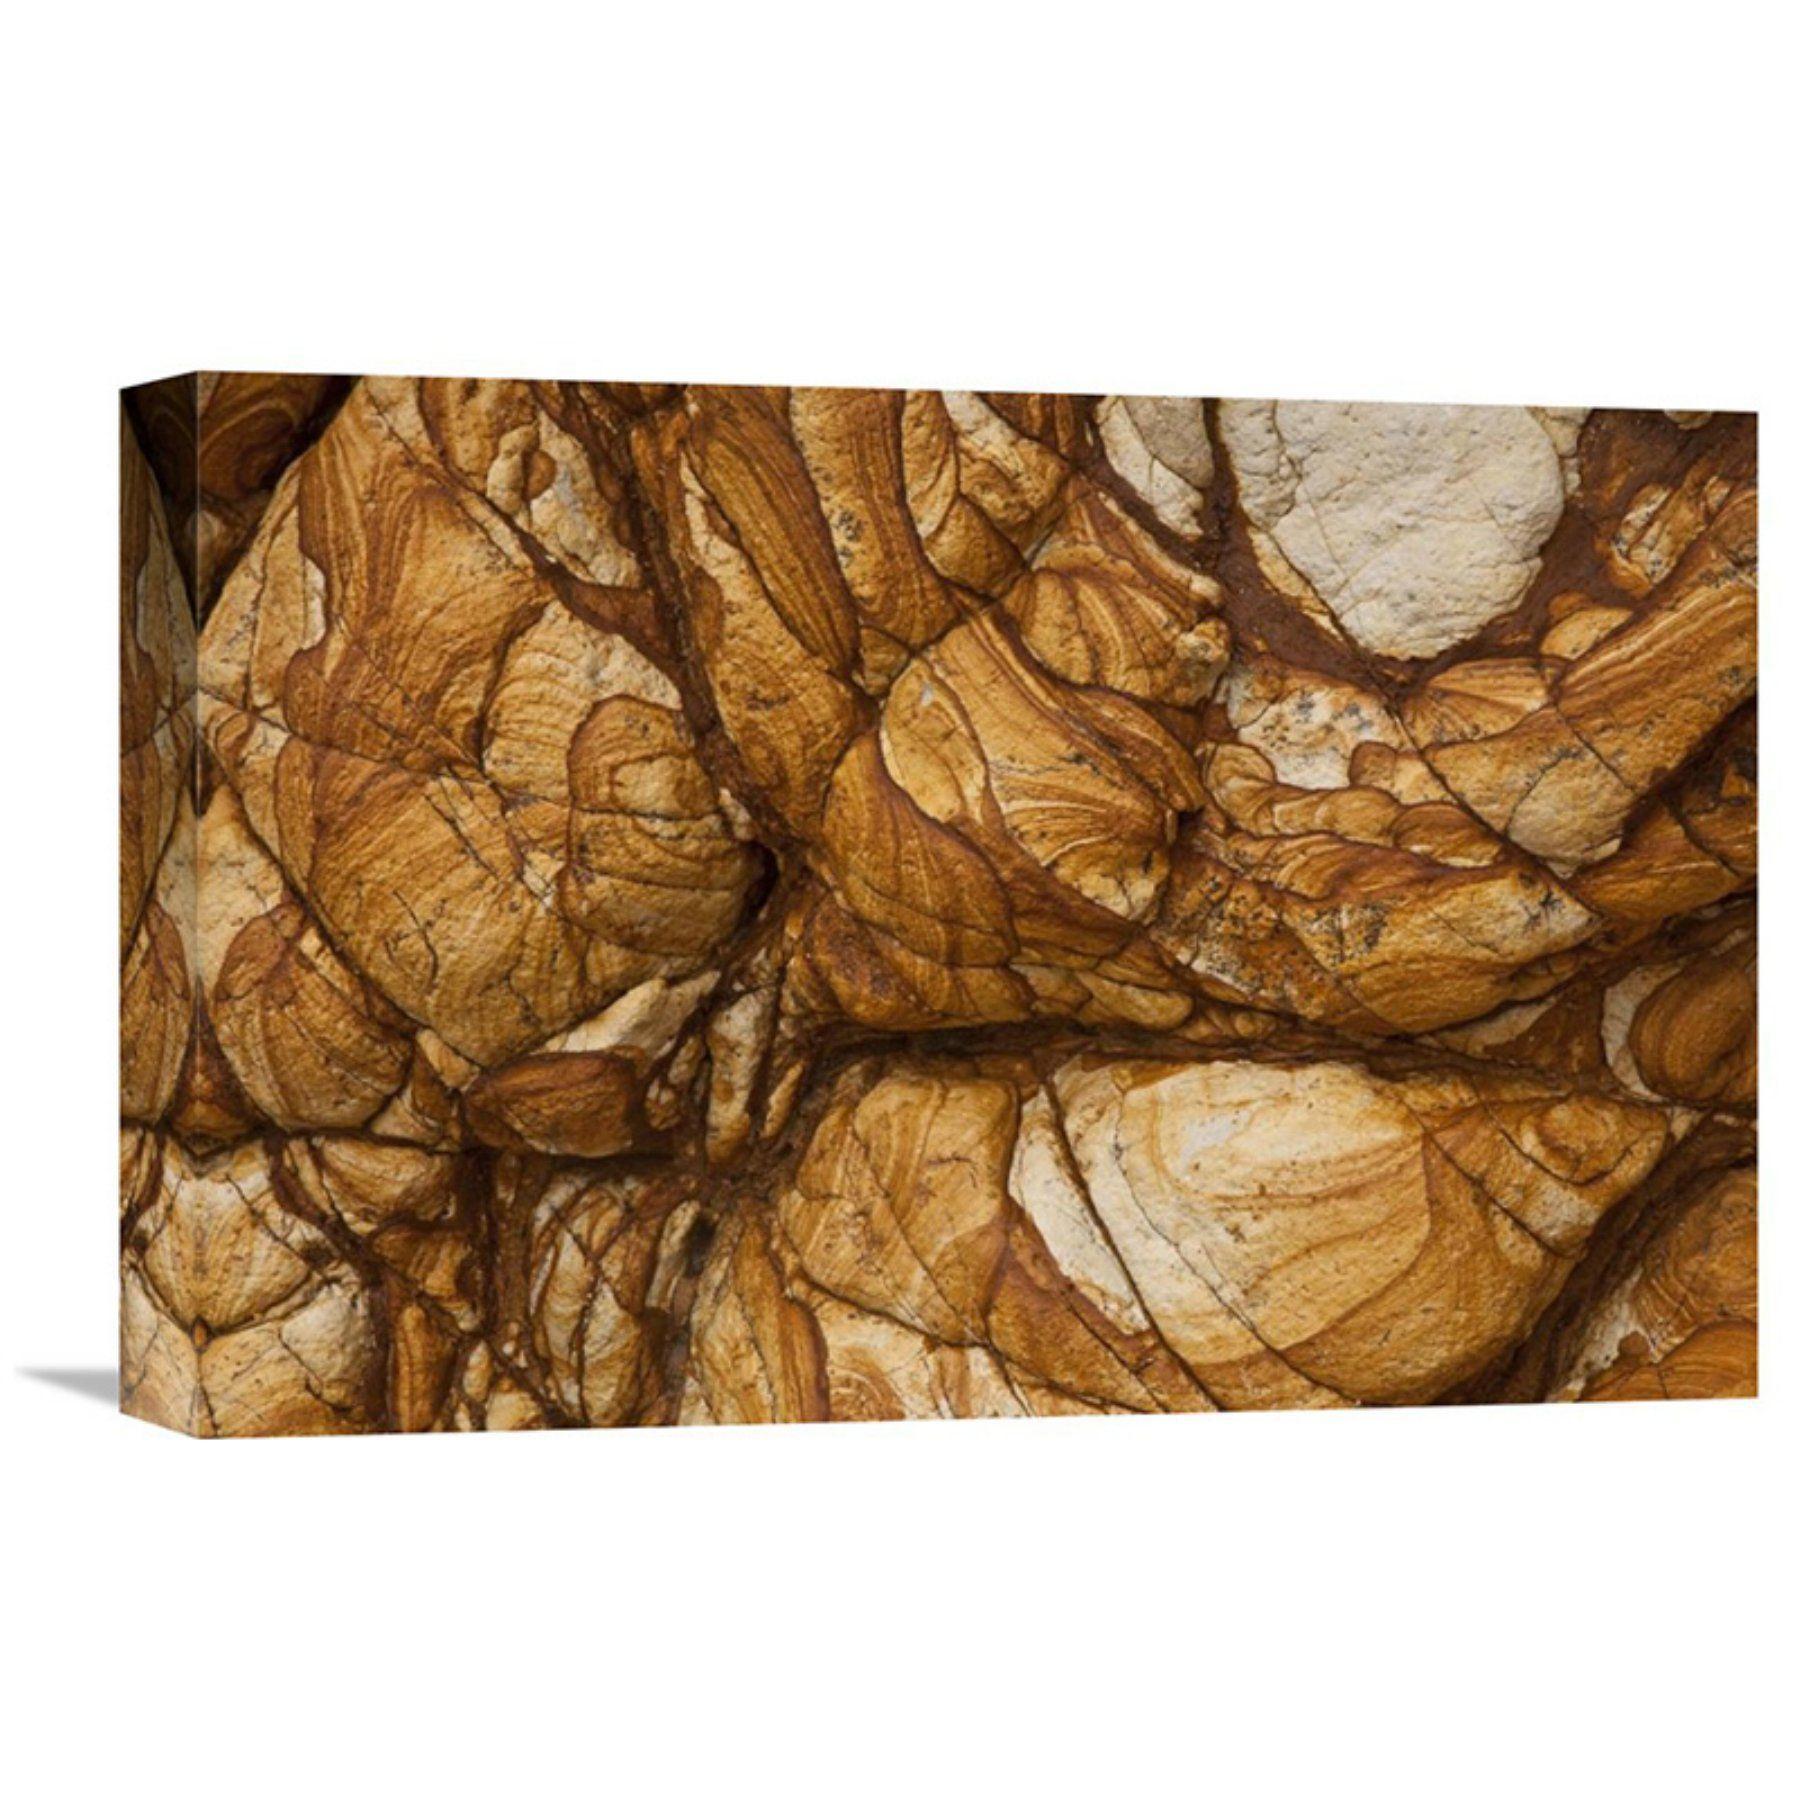 Global gallery volcanic rock onawe banks peninsula canterbury new zealand canvas wall art gcs 397763 1218 142